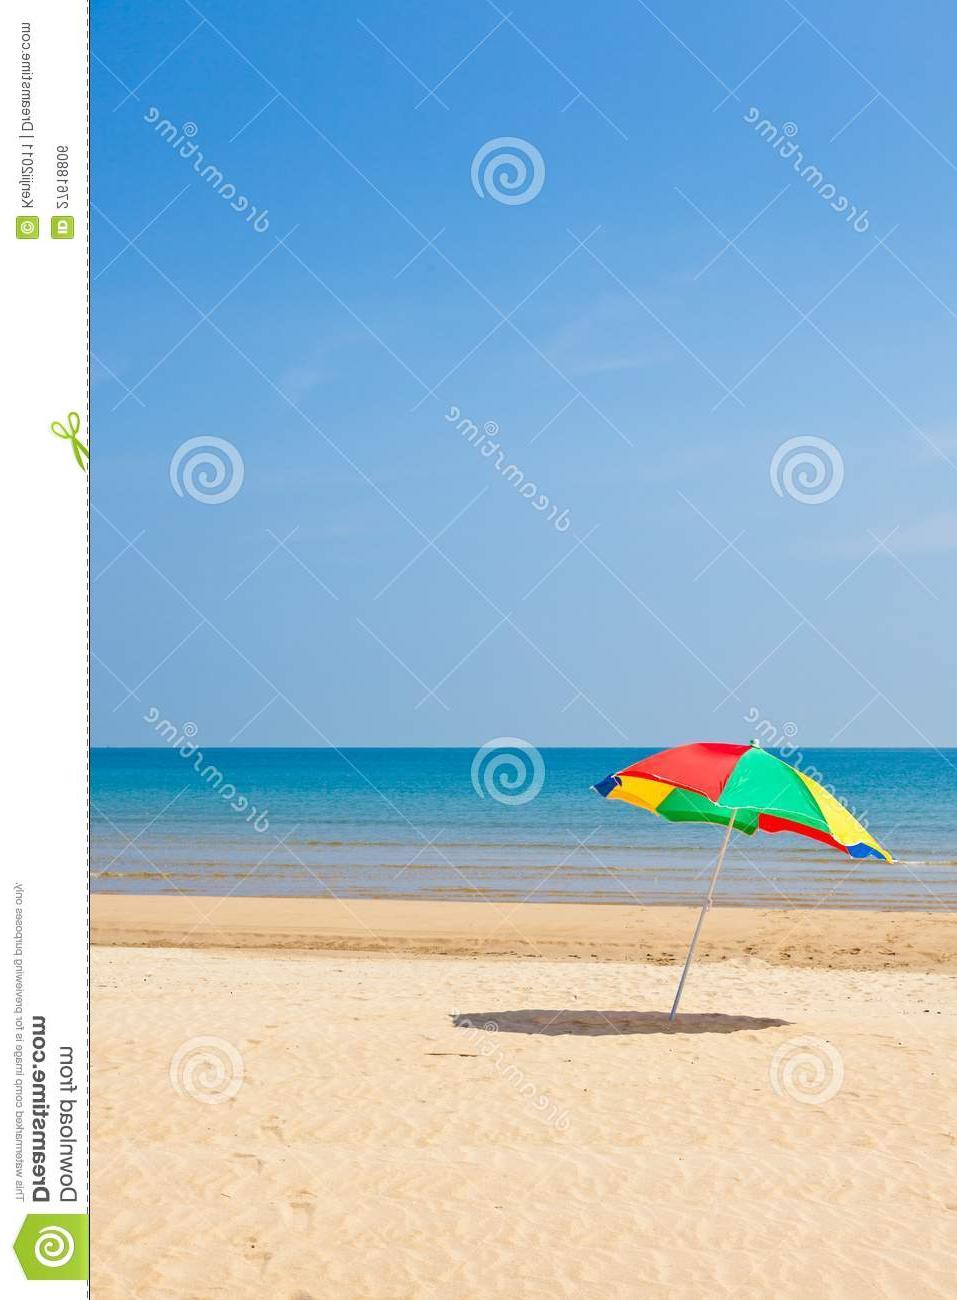 Seaside Beach Umbrellas Throughout Popular Seaside Beach Umbrella Stock Photo (View 15 of 20)